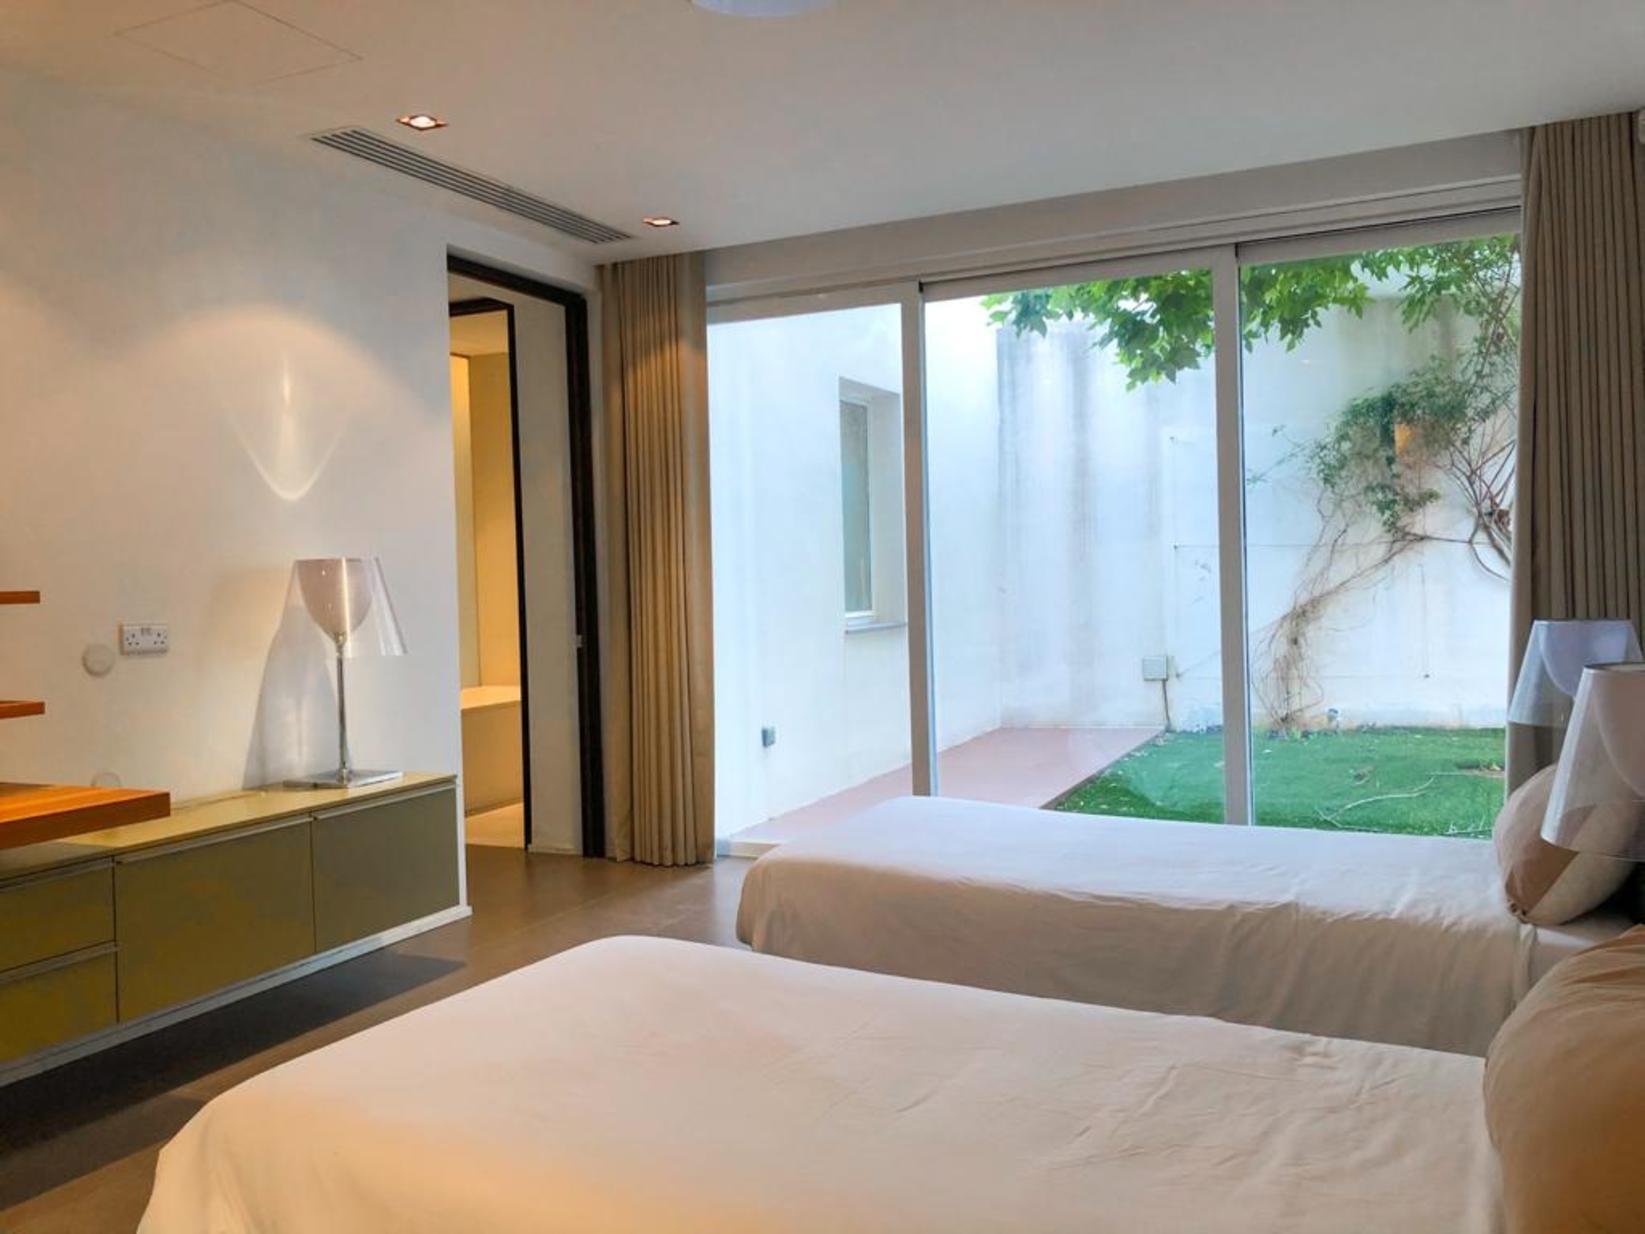 3 bed Villa For Rent in Bahar ic-Caghaq, Bahar ic-Caghaq - thumb 20